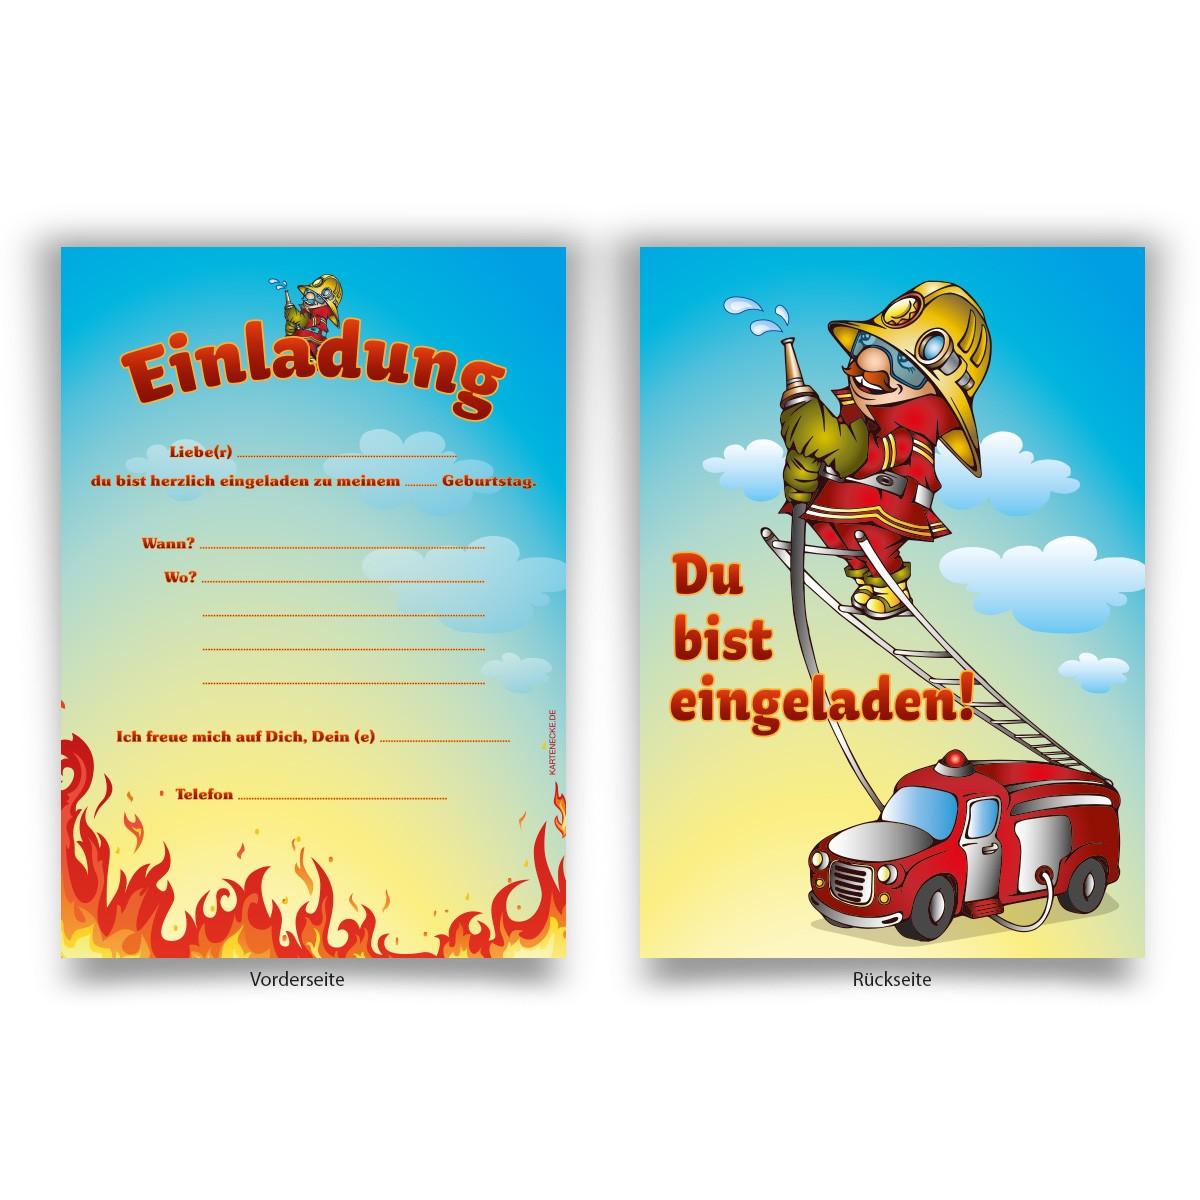 Einladung Kindergeburtstag Feuerwehr – thegirlsroom